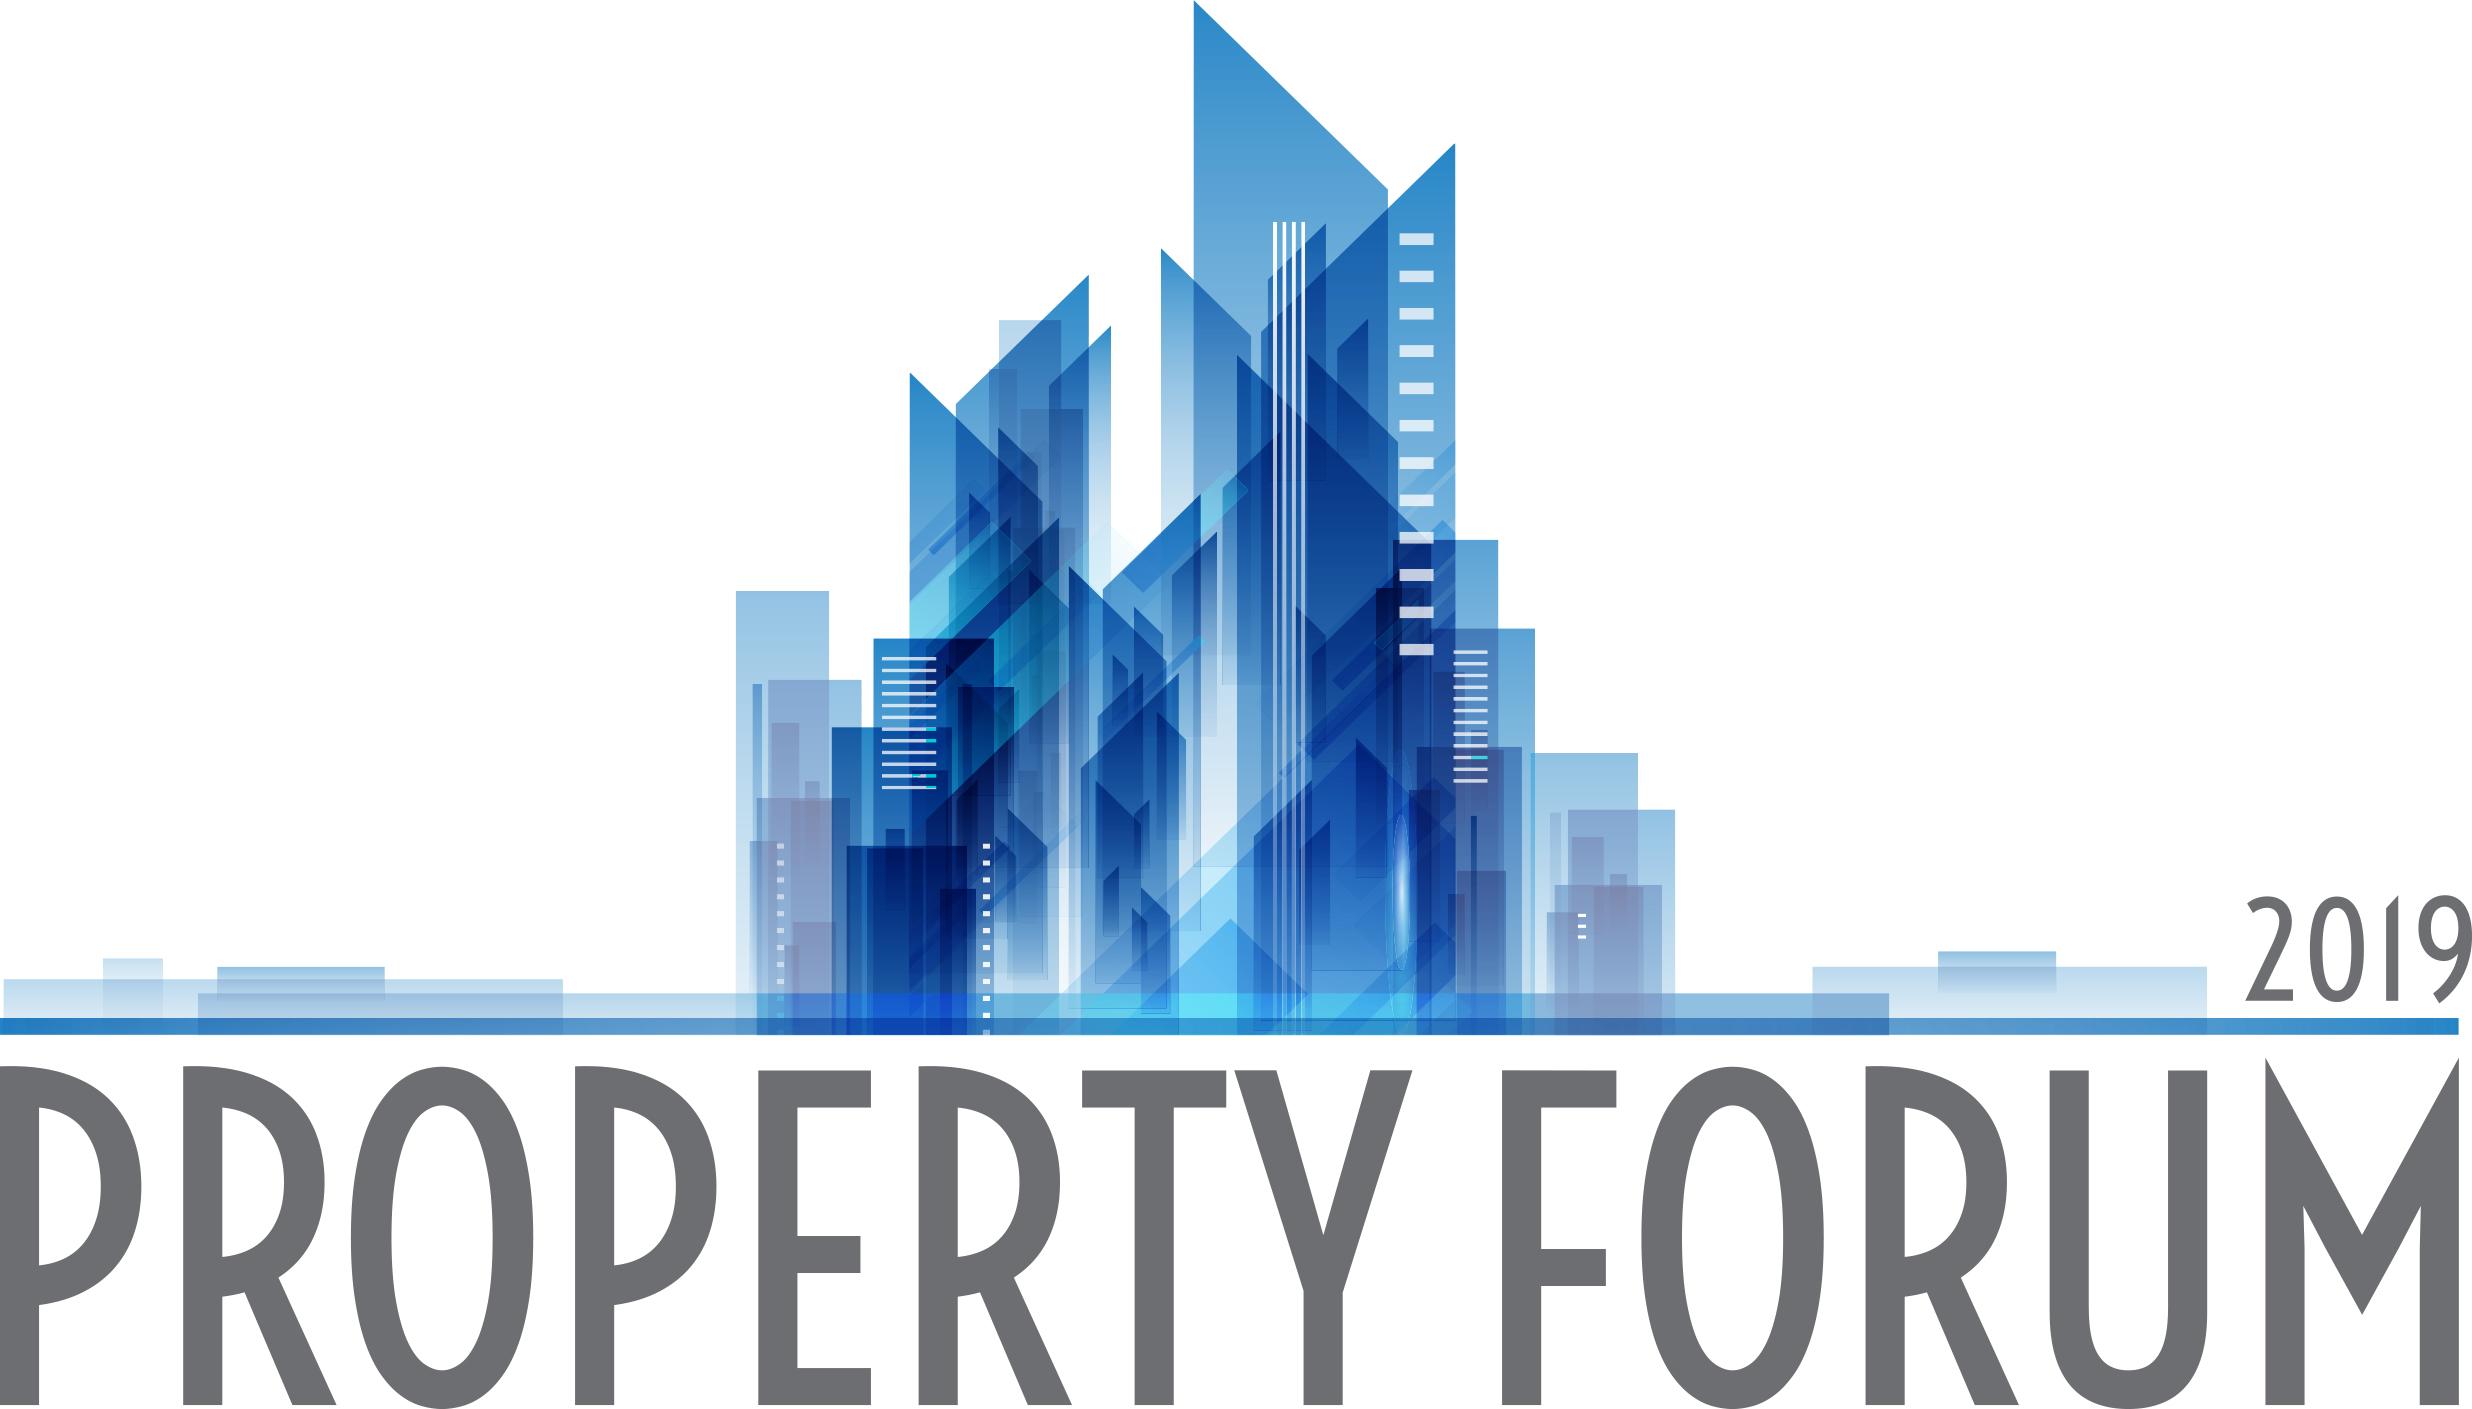 Hotele Diament Partnerem Property Forum Warszawa 2019